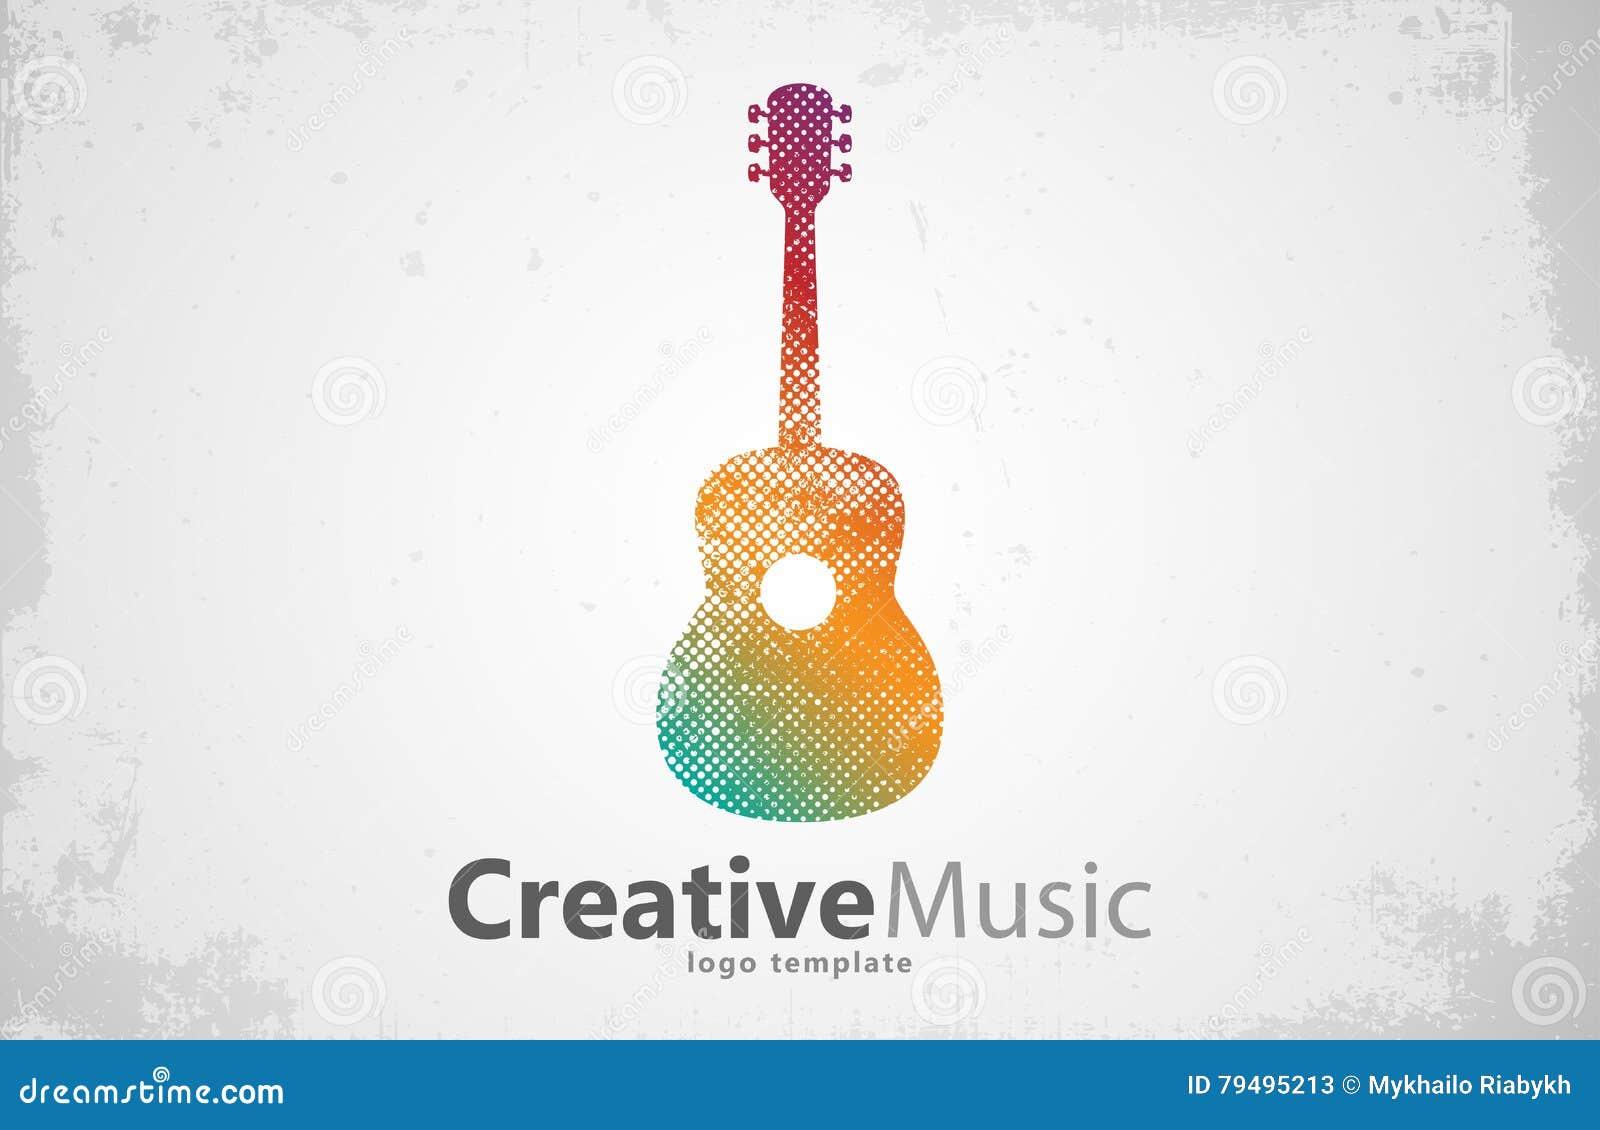 GITARREN-LOGO kreativ Musik Entwurf